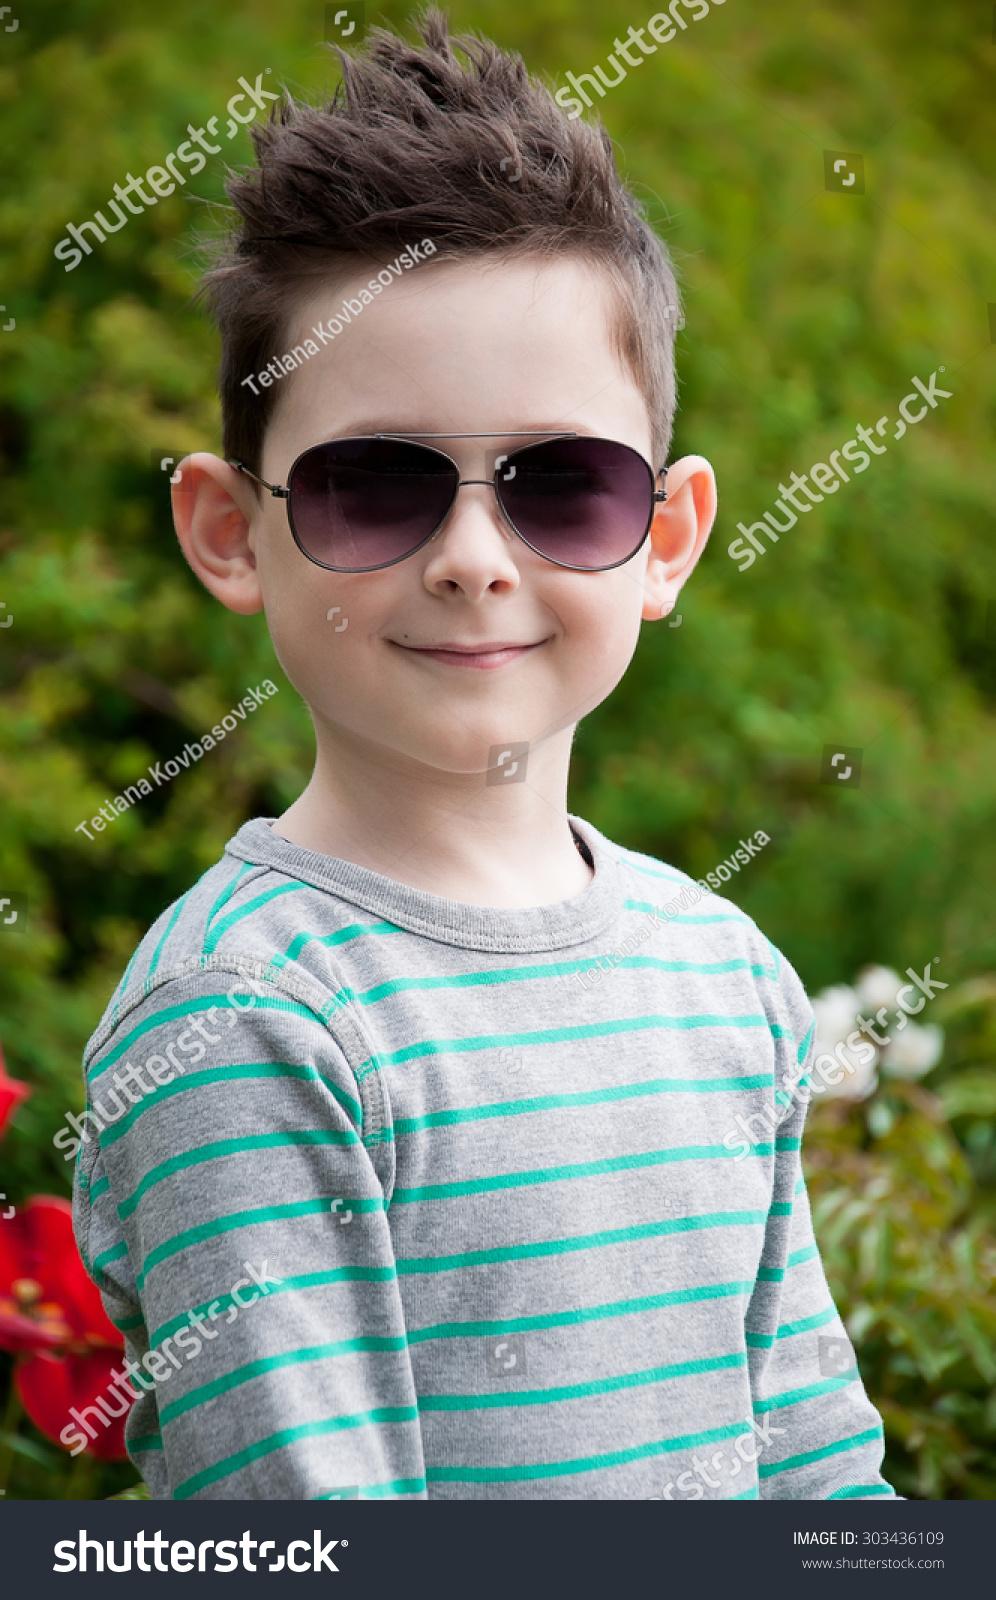 Look - Baby stylish boy photo video